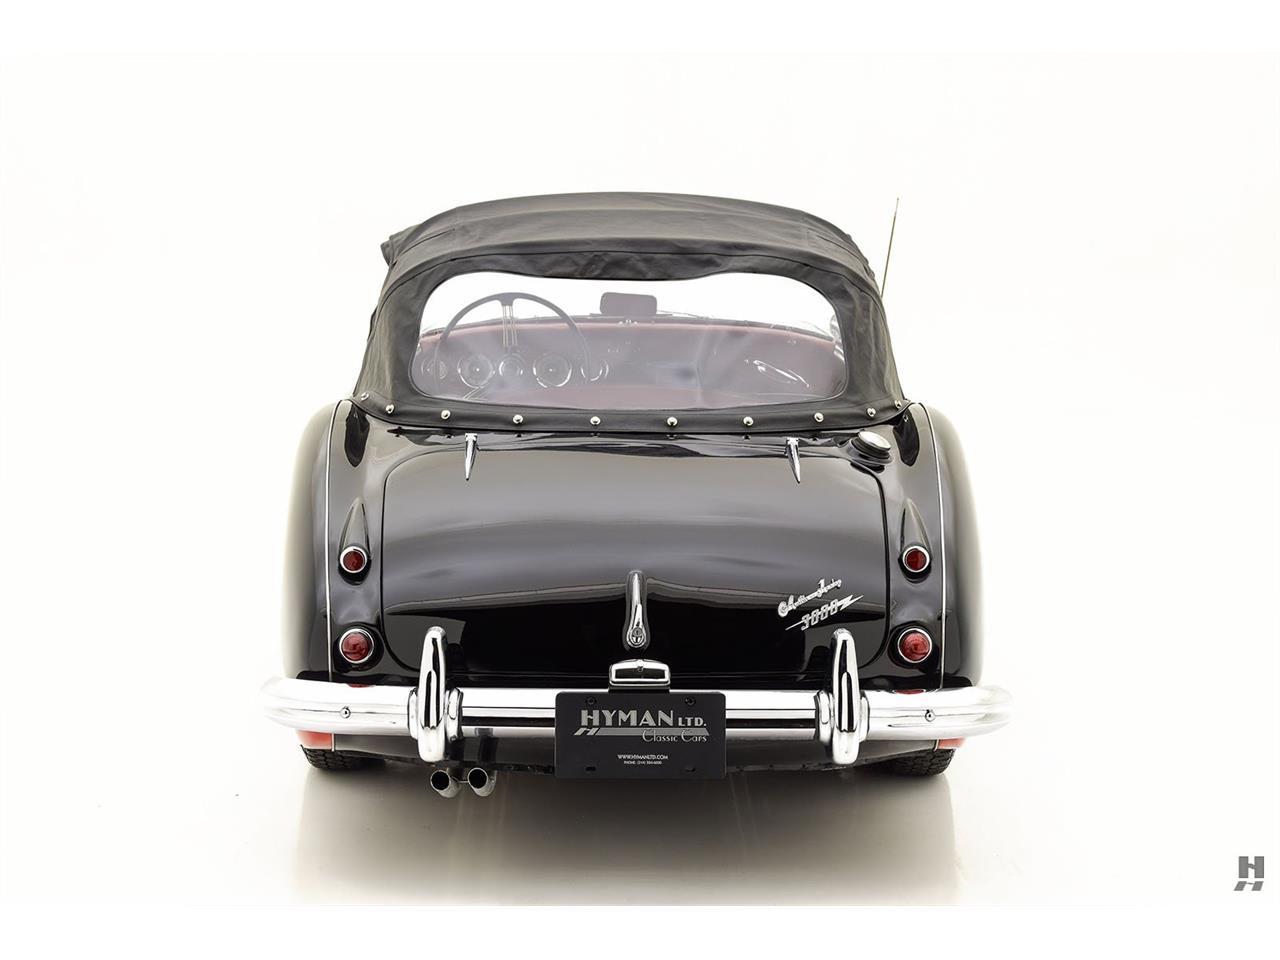 1962 Austin-Healey 3000 Mark II (CC-1209211) for sale in Saint Louis, Missouri